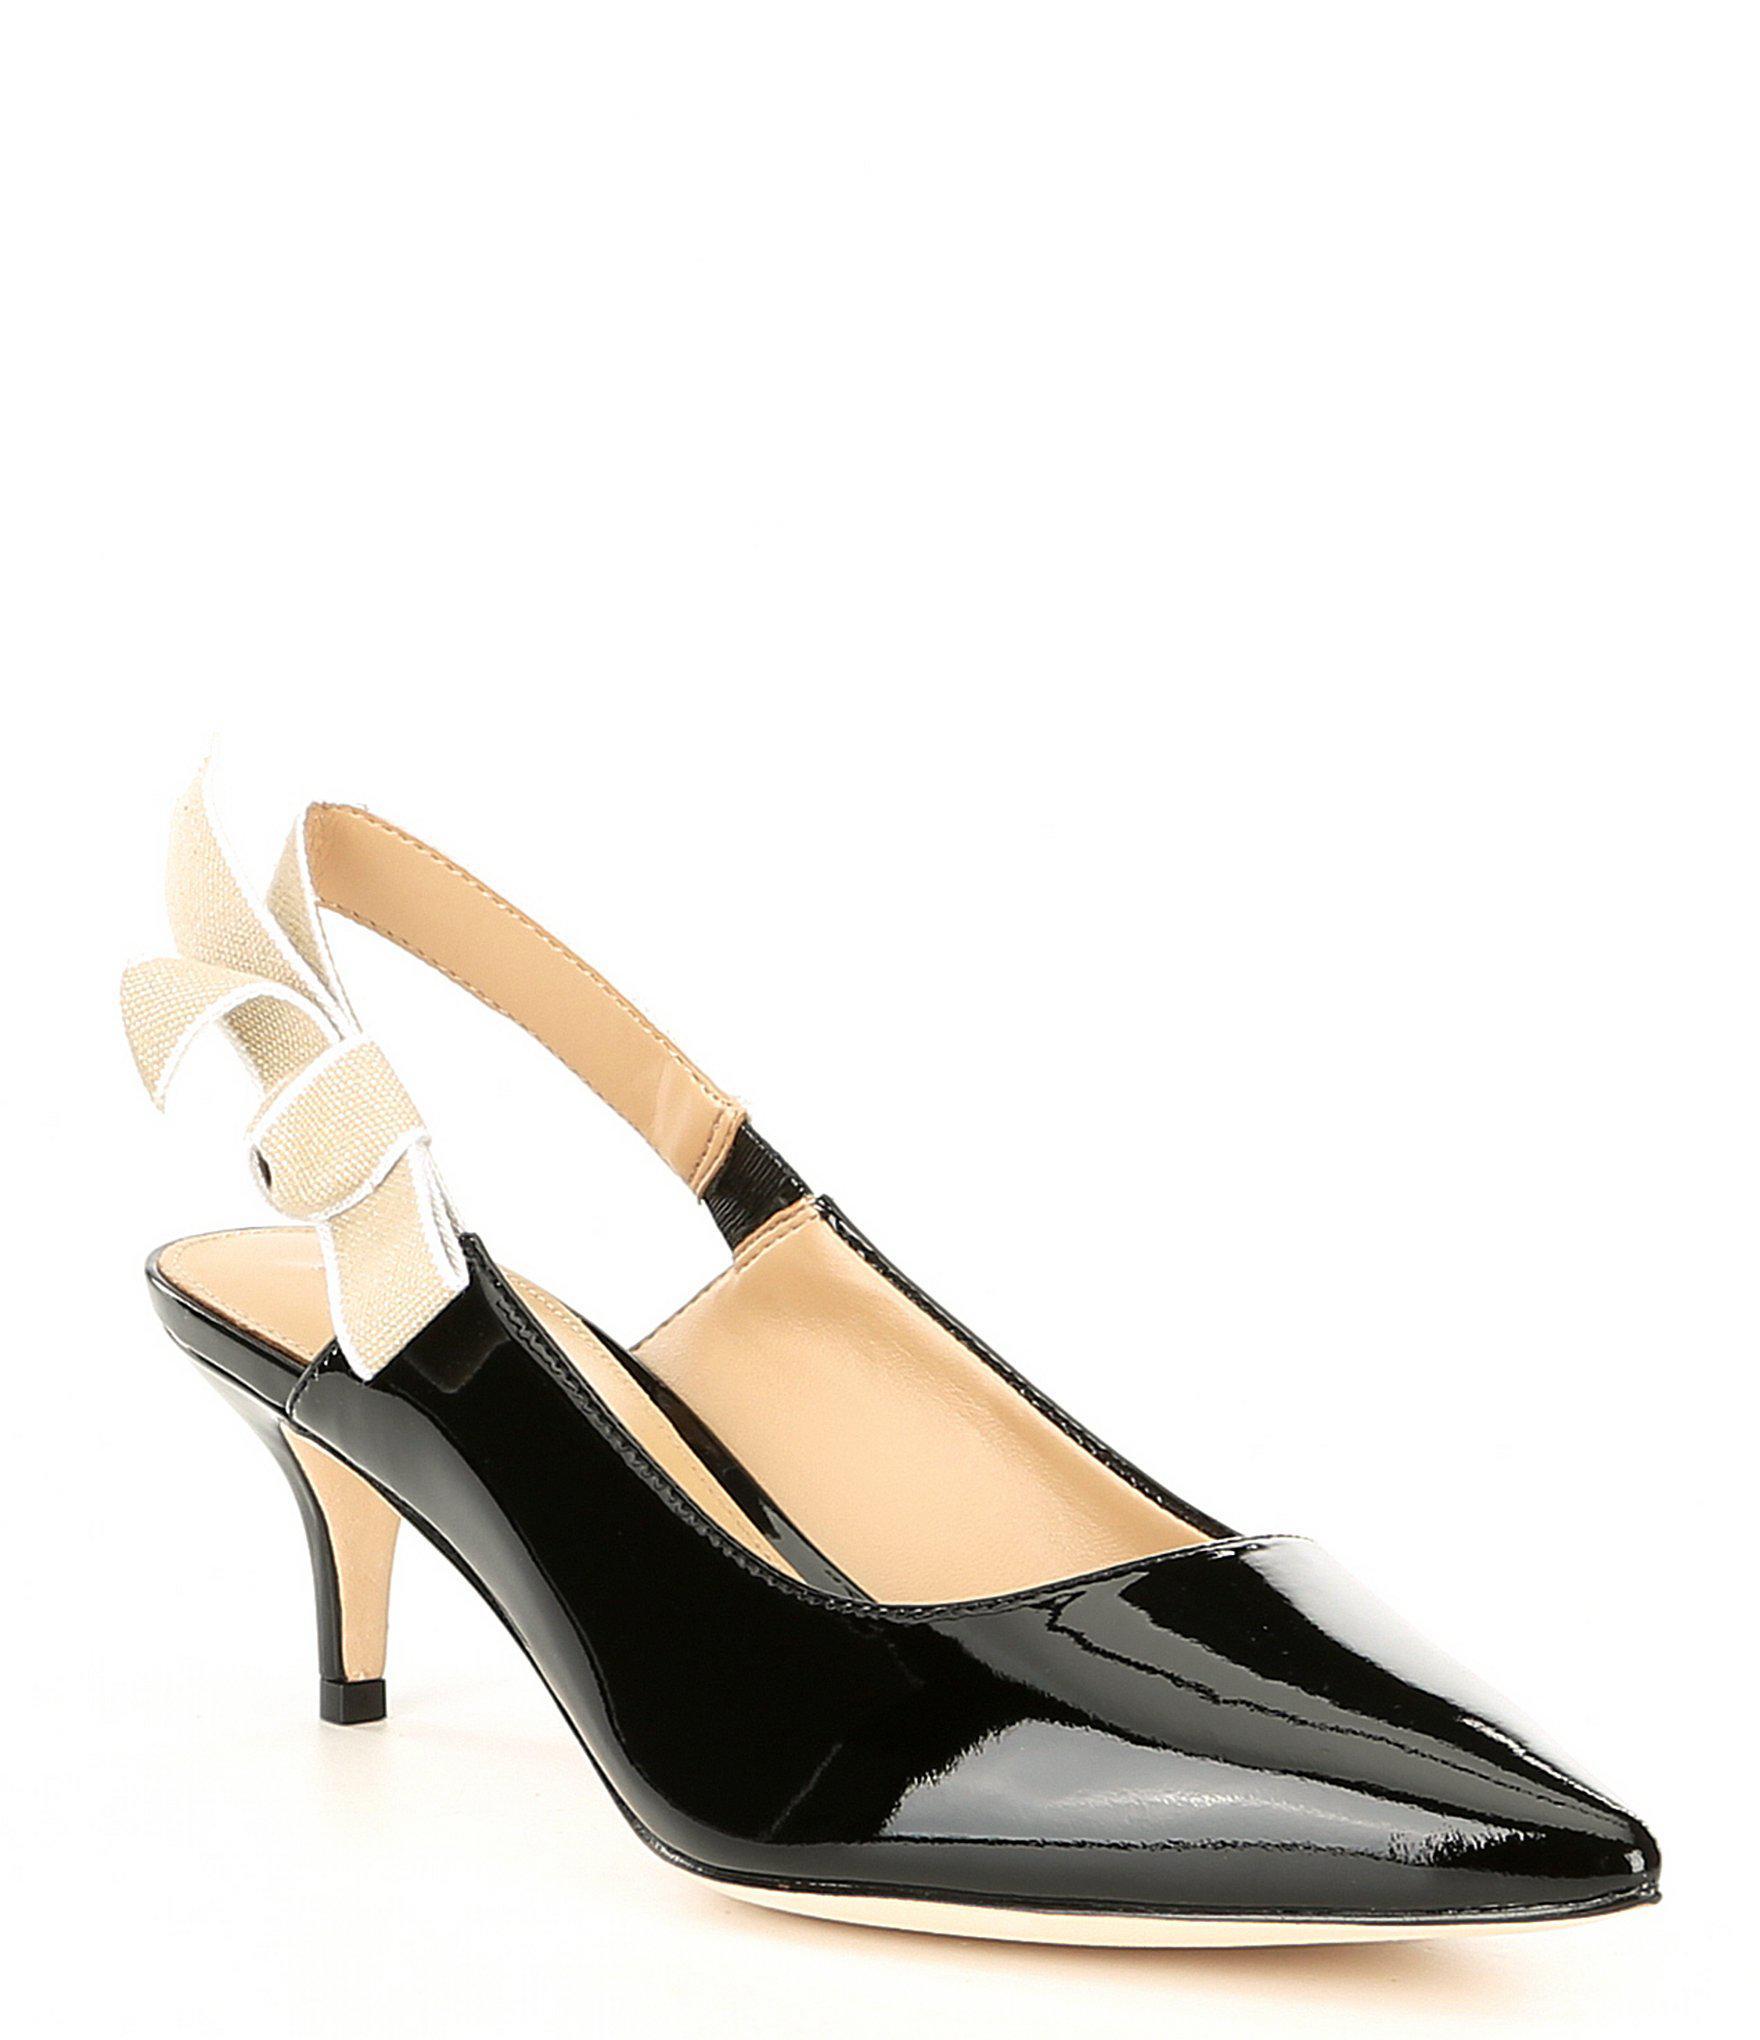 f18b14a163c Lyst - Antonio Melani Luvata Patent Leather Slingback Kitten Heel ...